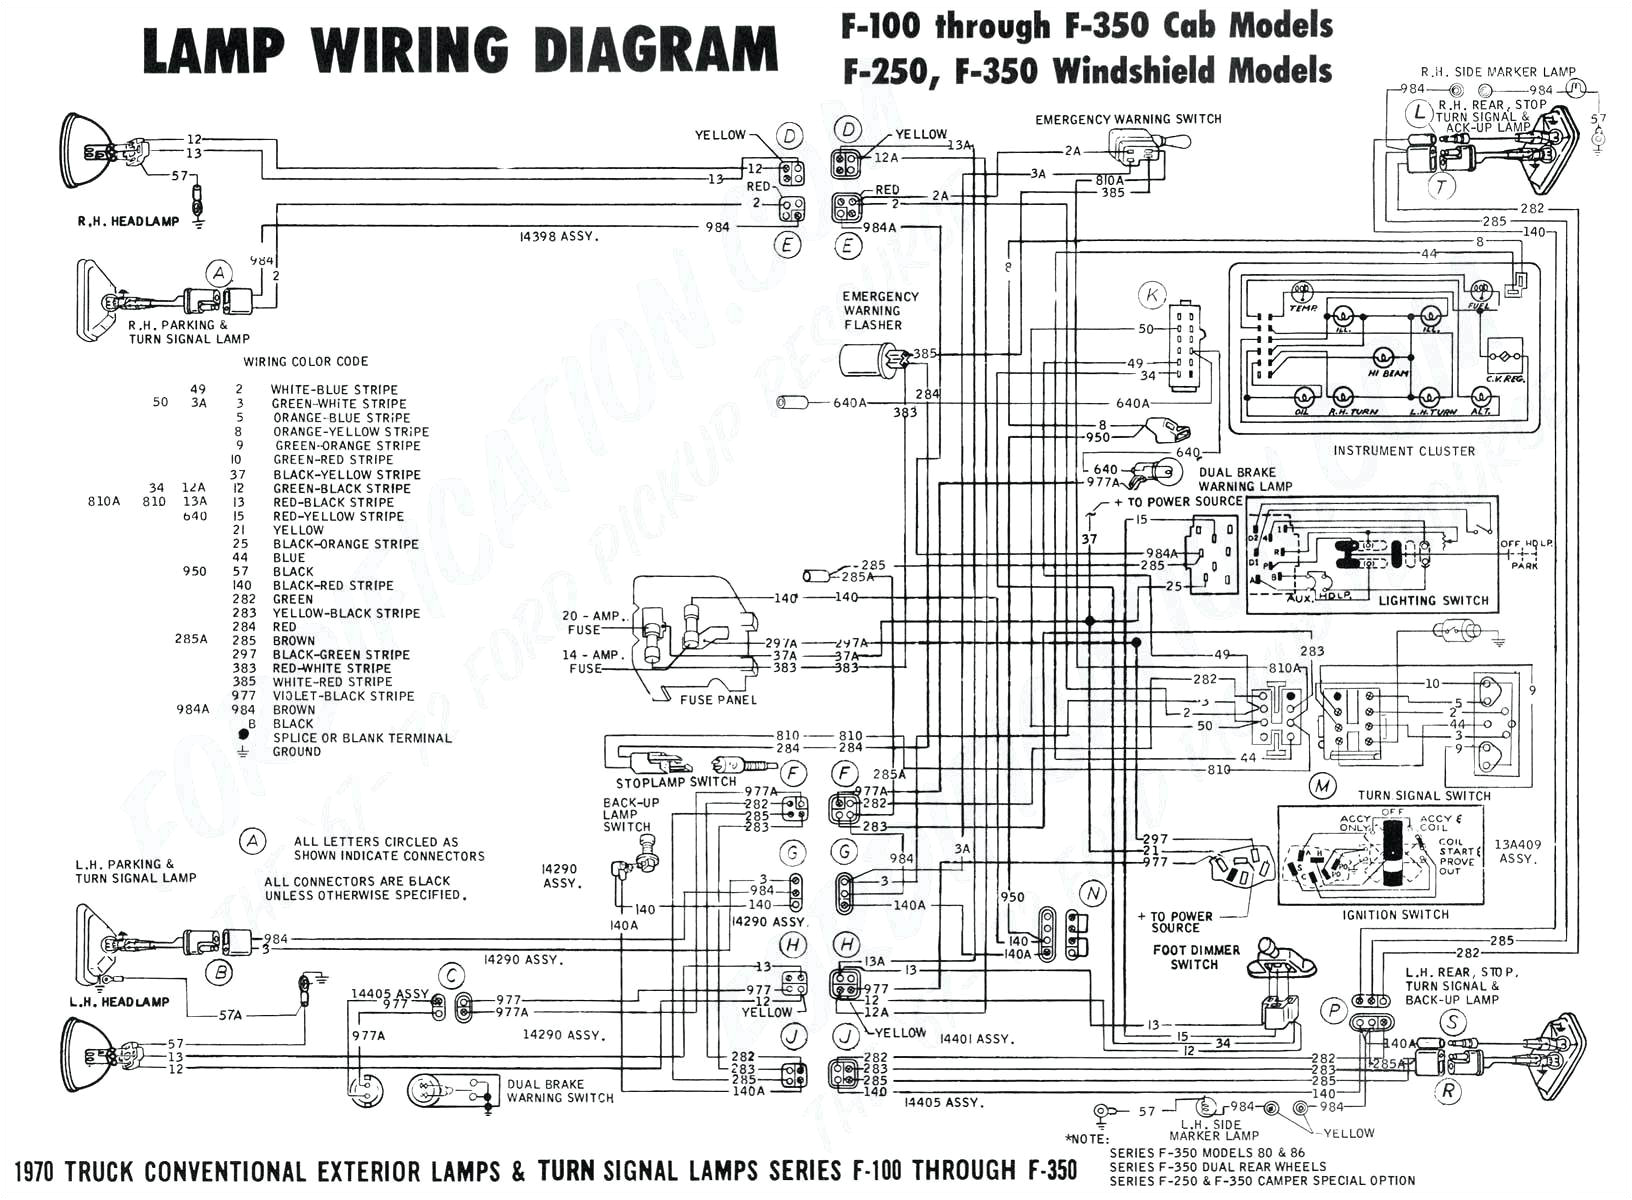 1999 chevy s10 wiring diagram best of 2003 chevy s10 exhaust system 1999 chevrolet blazer wiring diagram